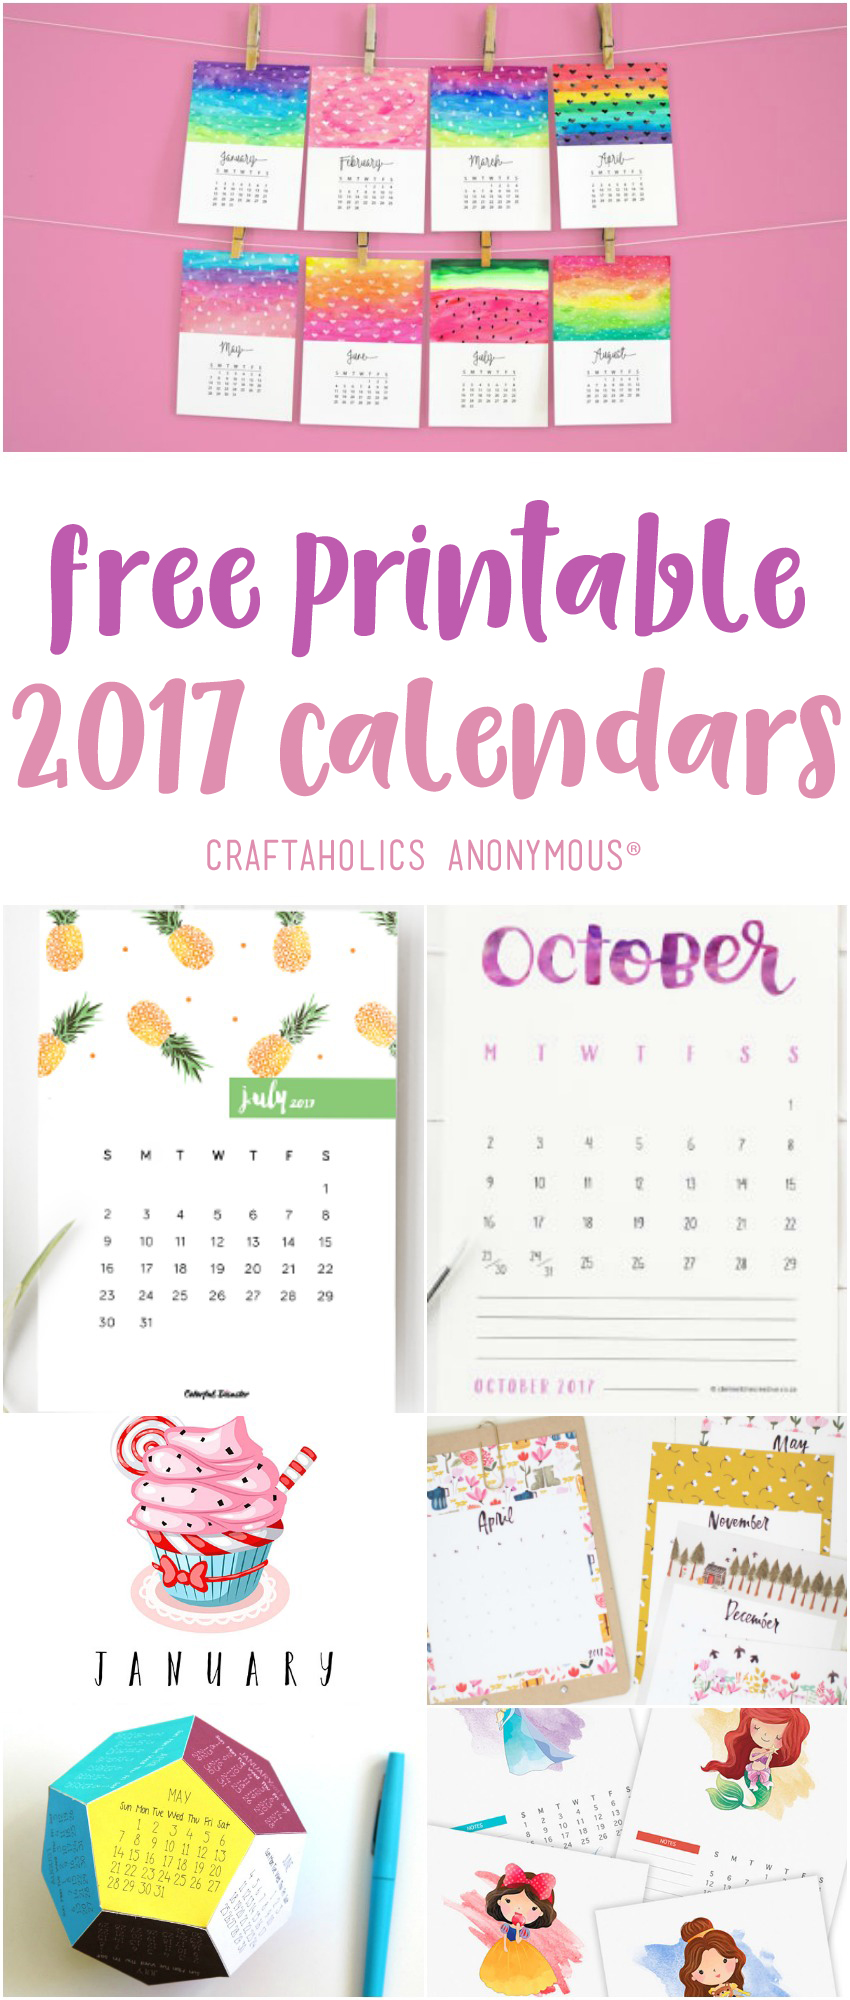 25-bright-free-printable-2017-calendars